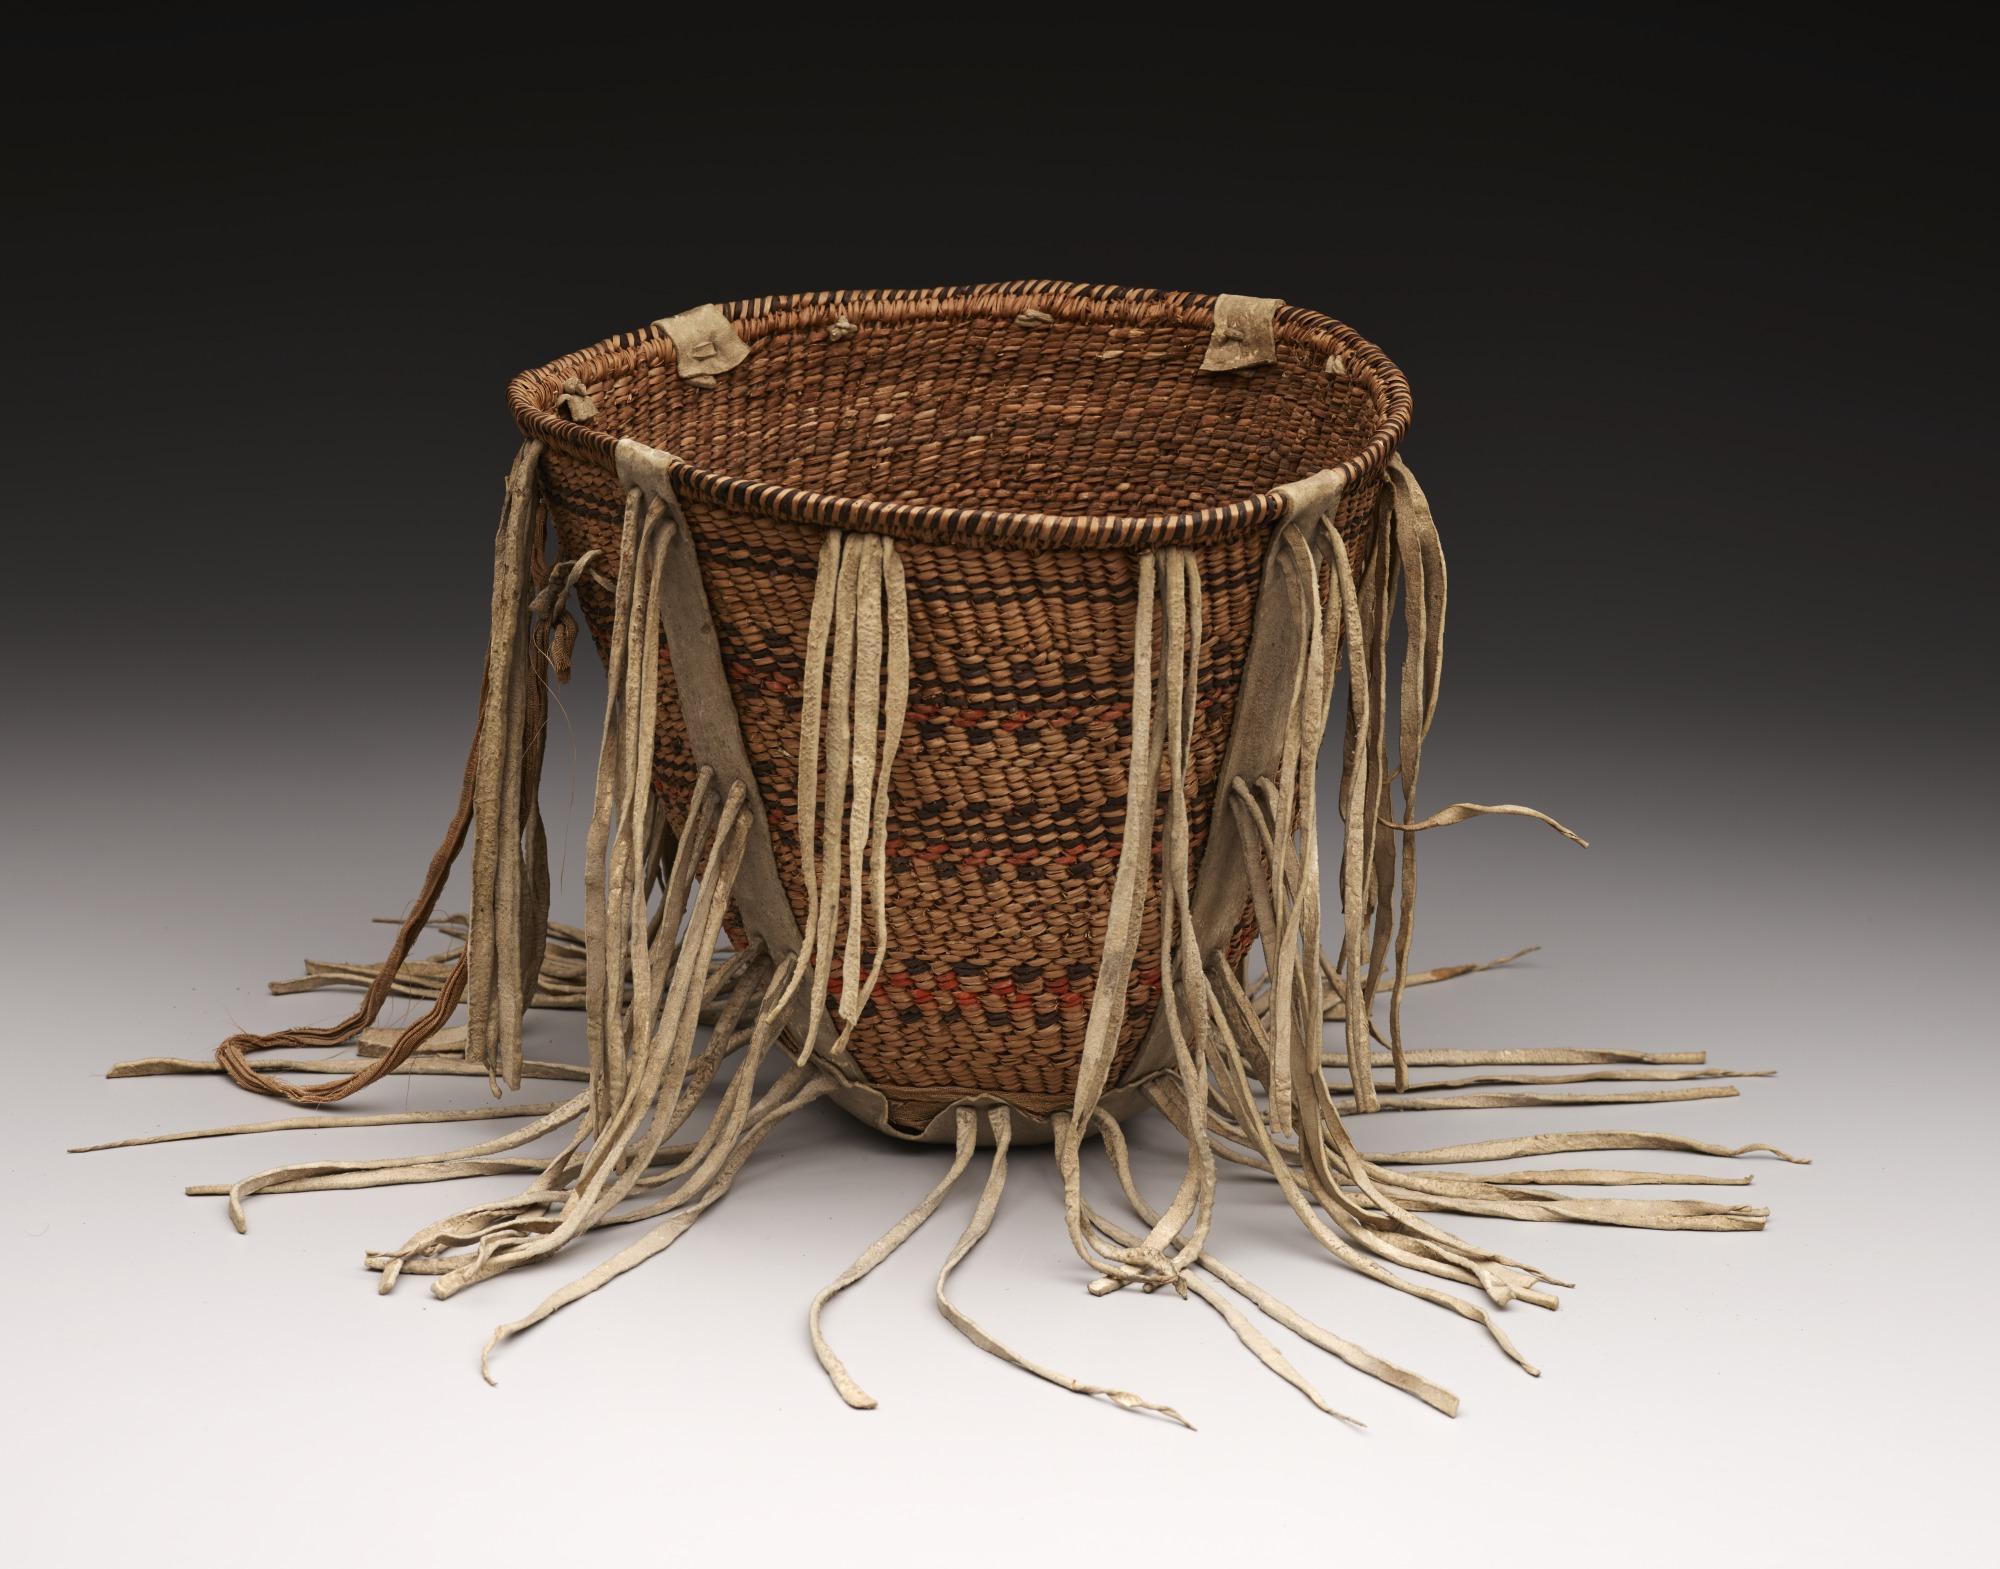 Coil Basket Weaving Patterns : Diy coil basket weaving dma canvas